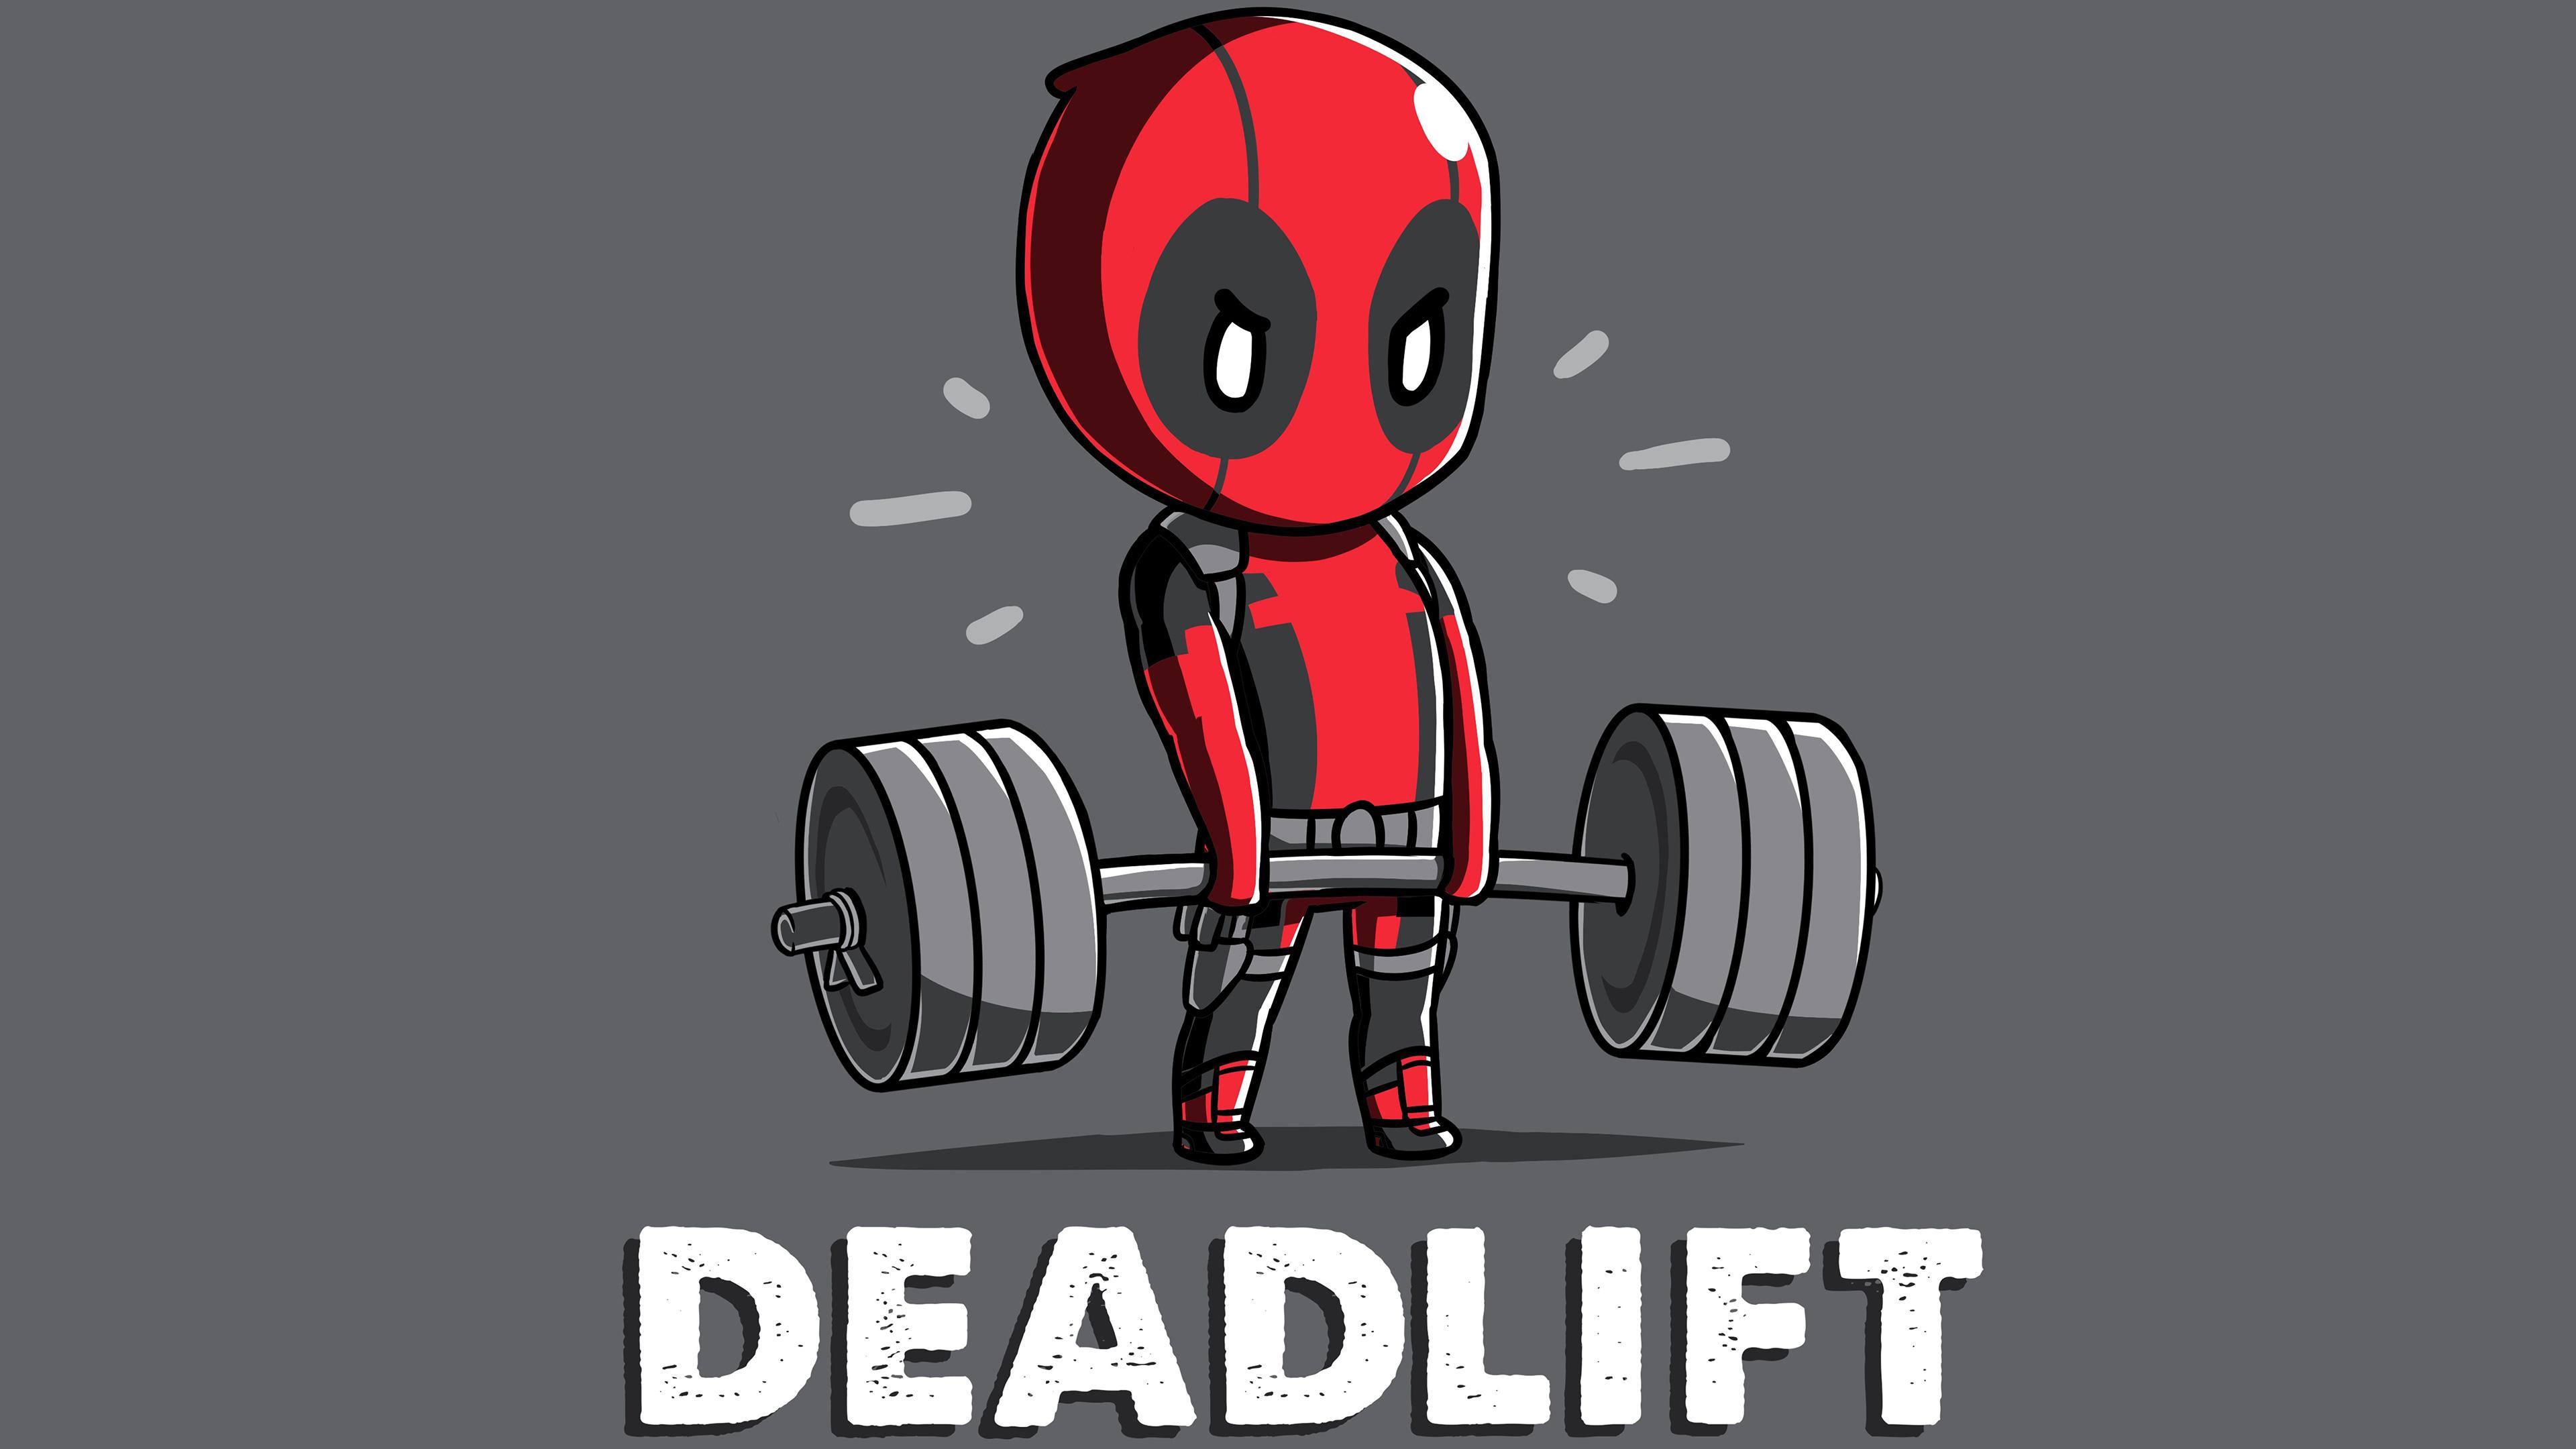 deadpool deadlift funny 1575663245 - Deadpool Deadlift Funny -